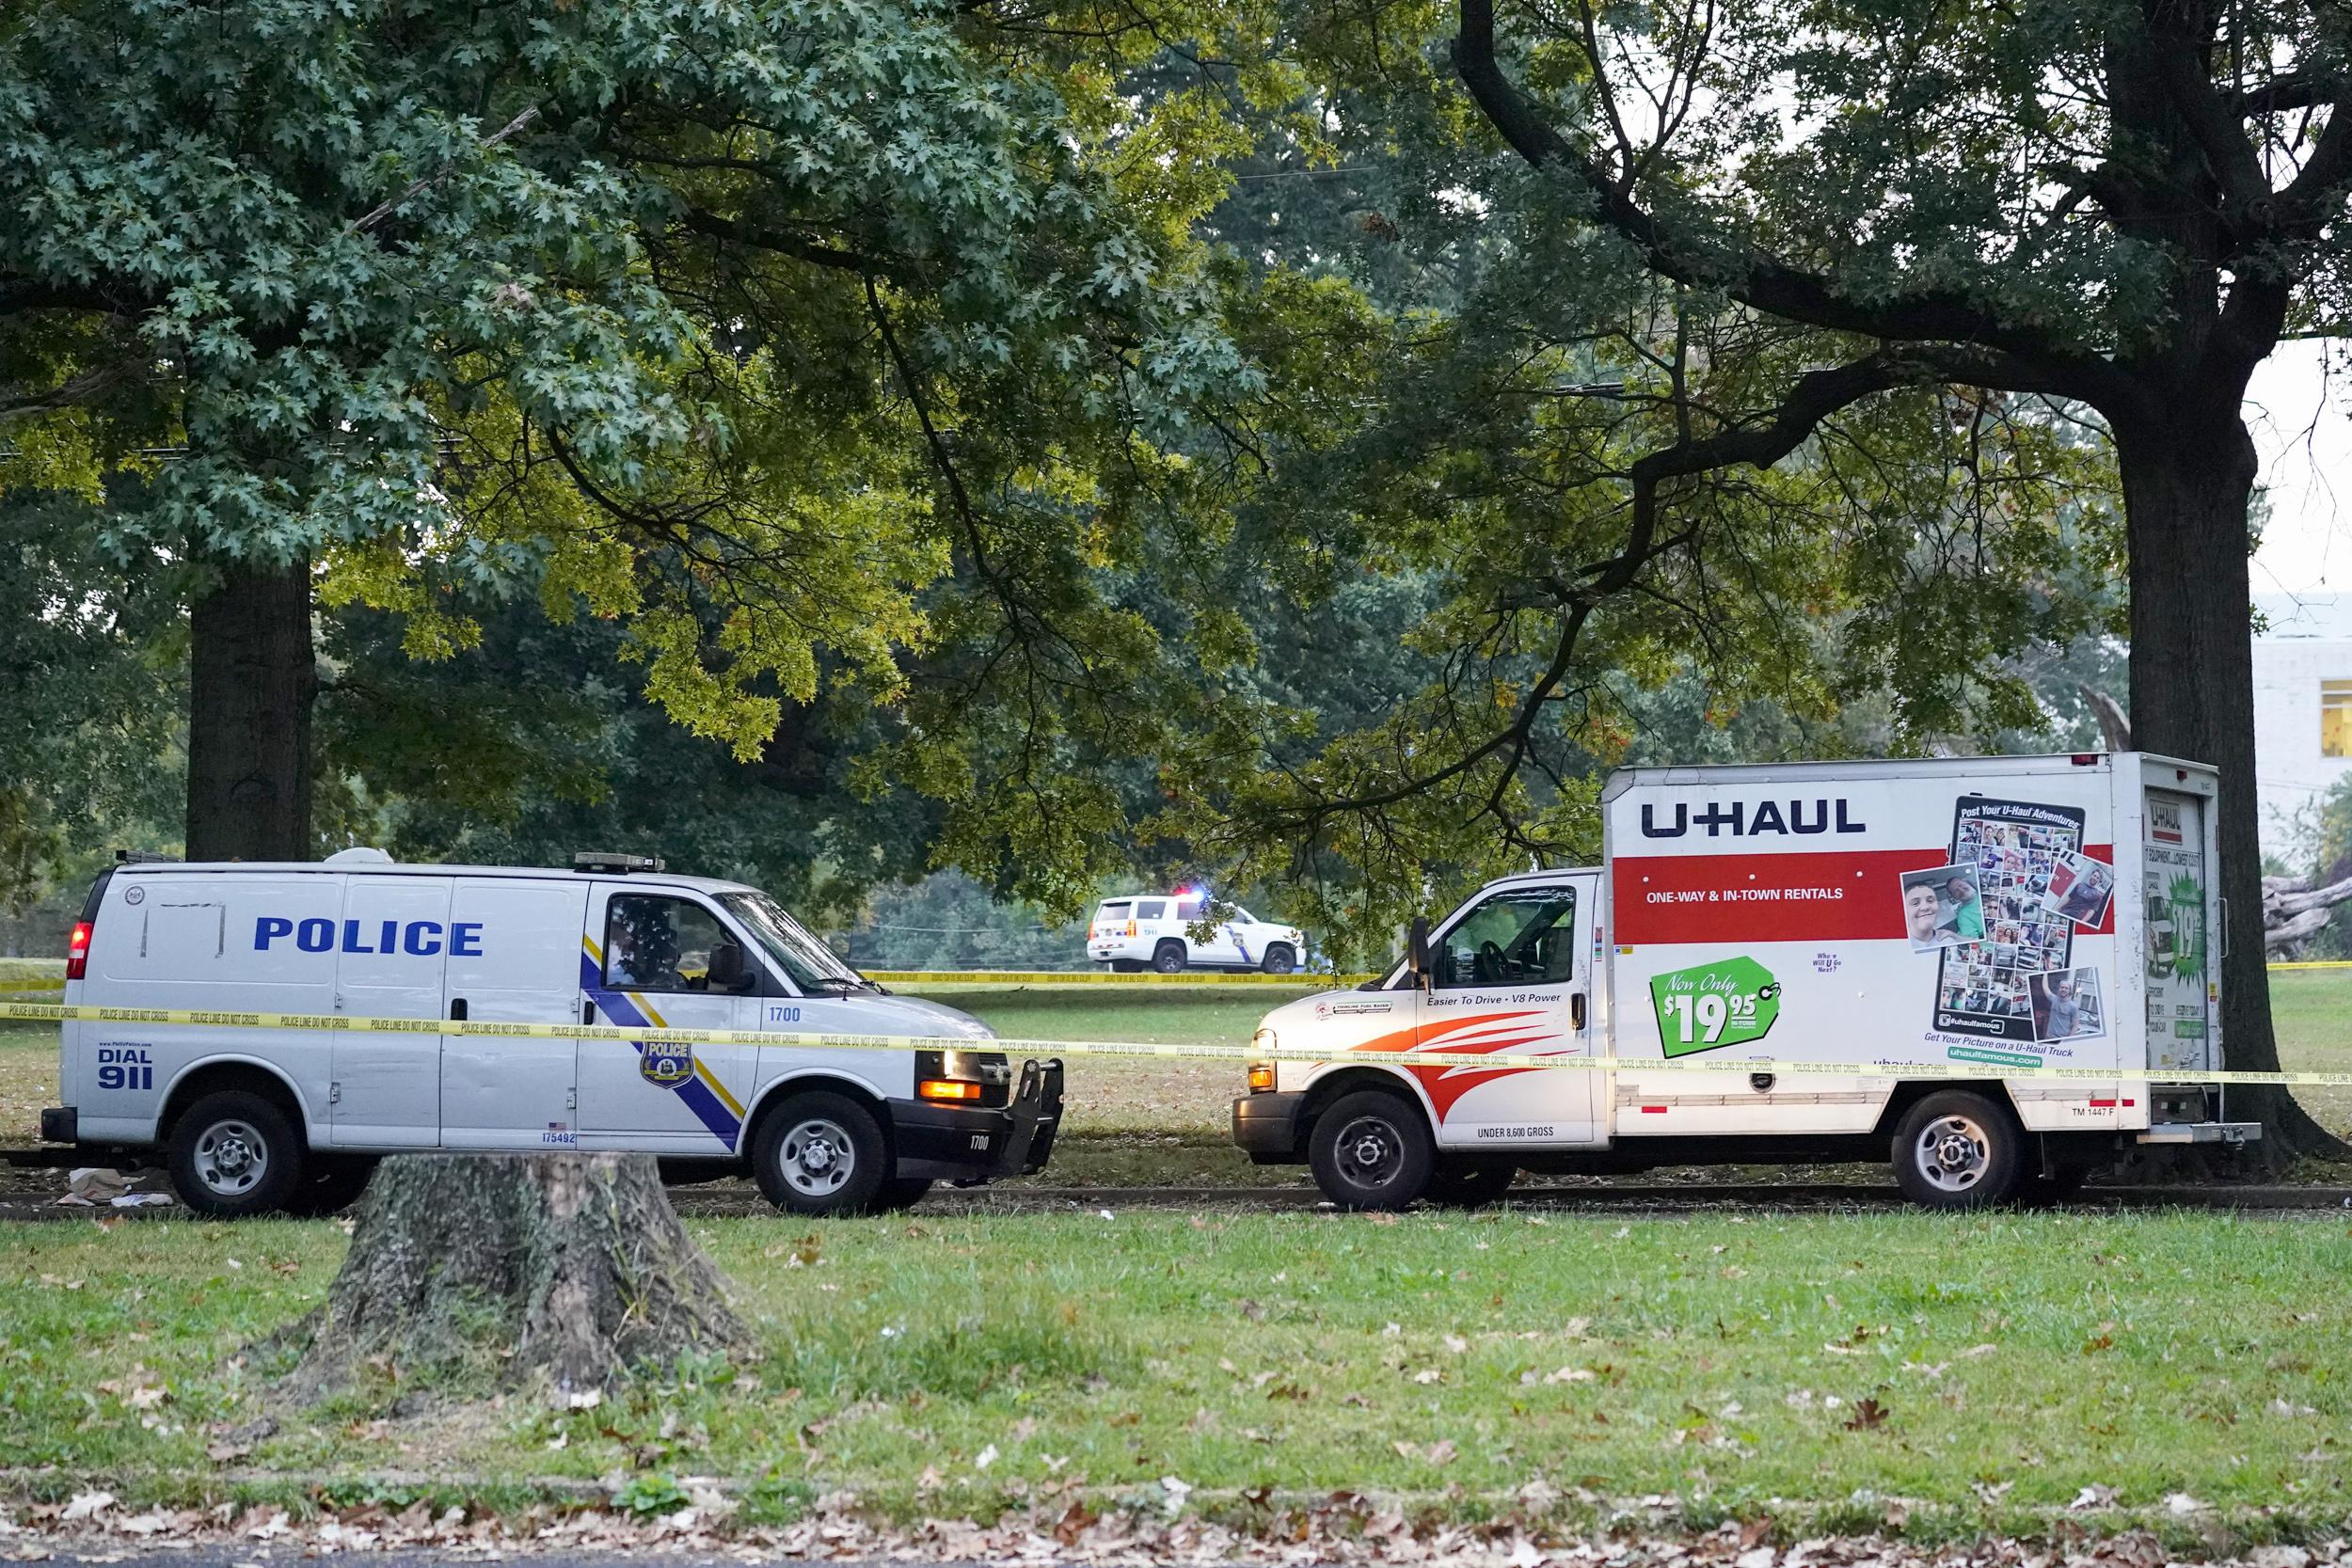 Employee killed in Philadelphia hospital shooting; 2 police officers injured in shootout